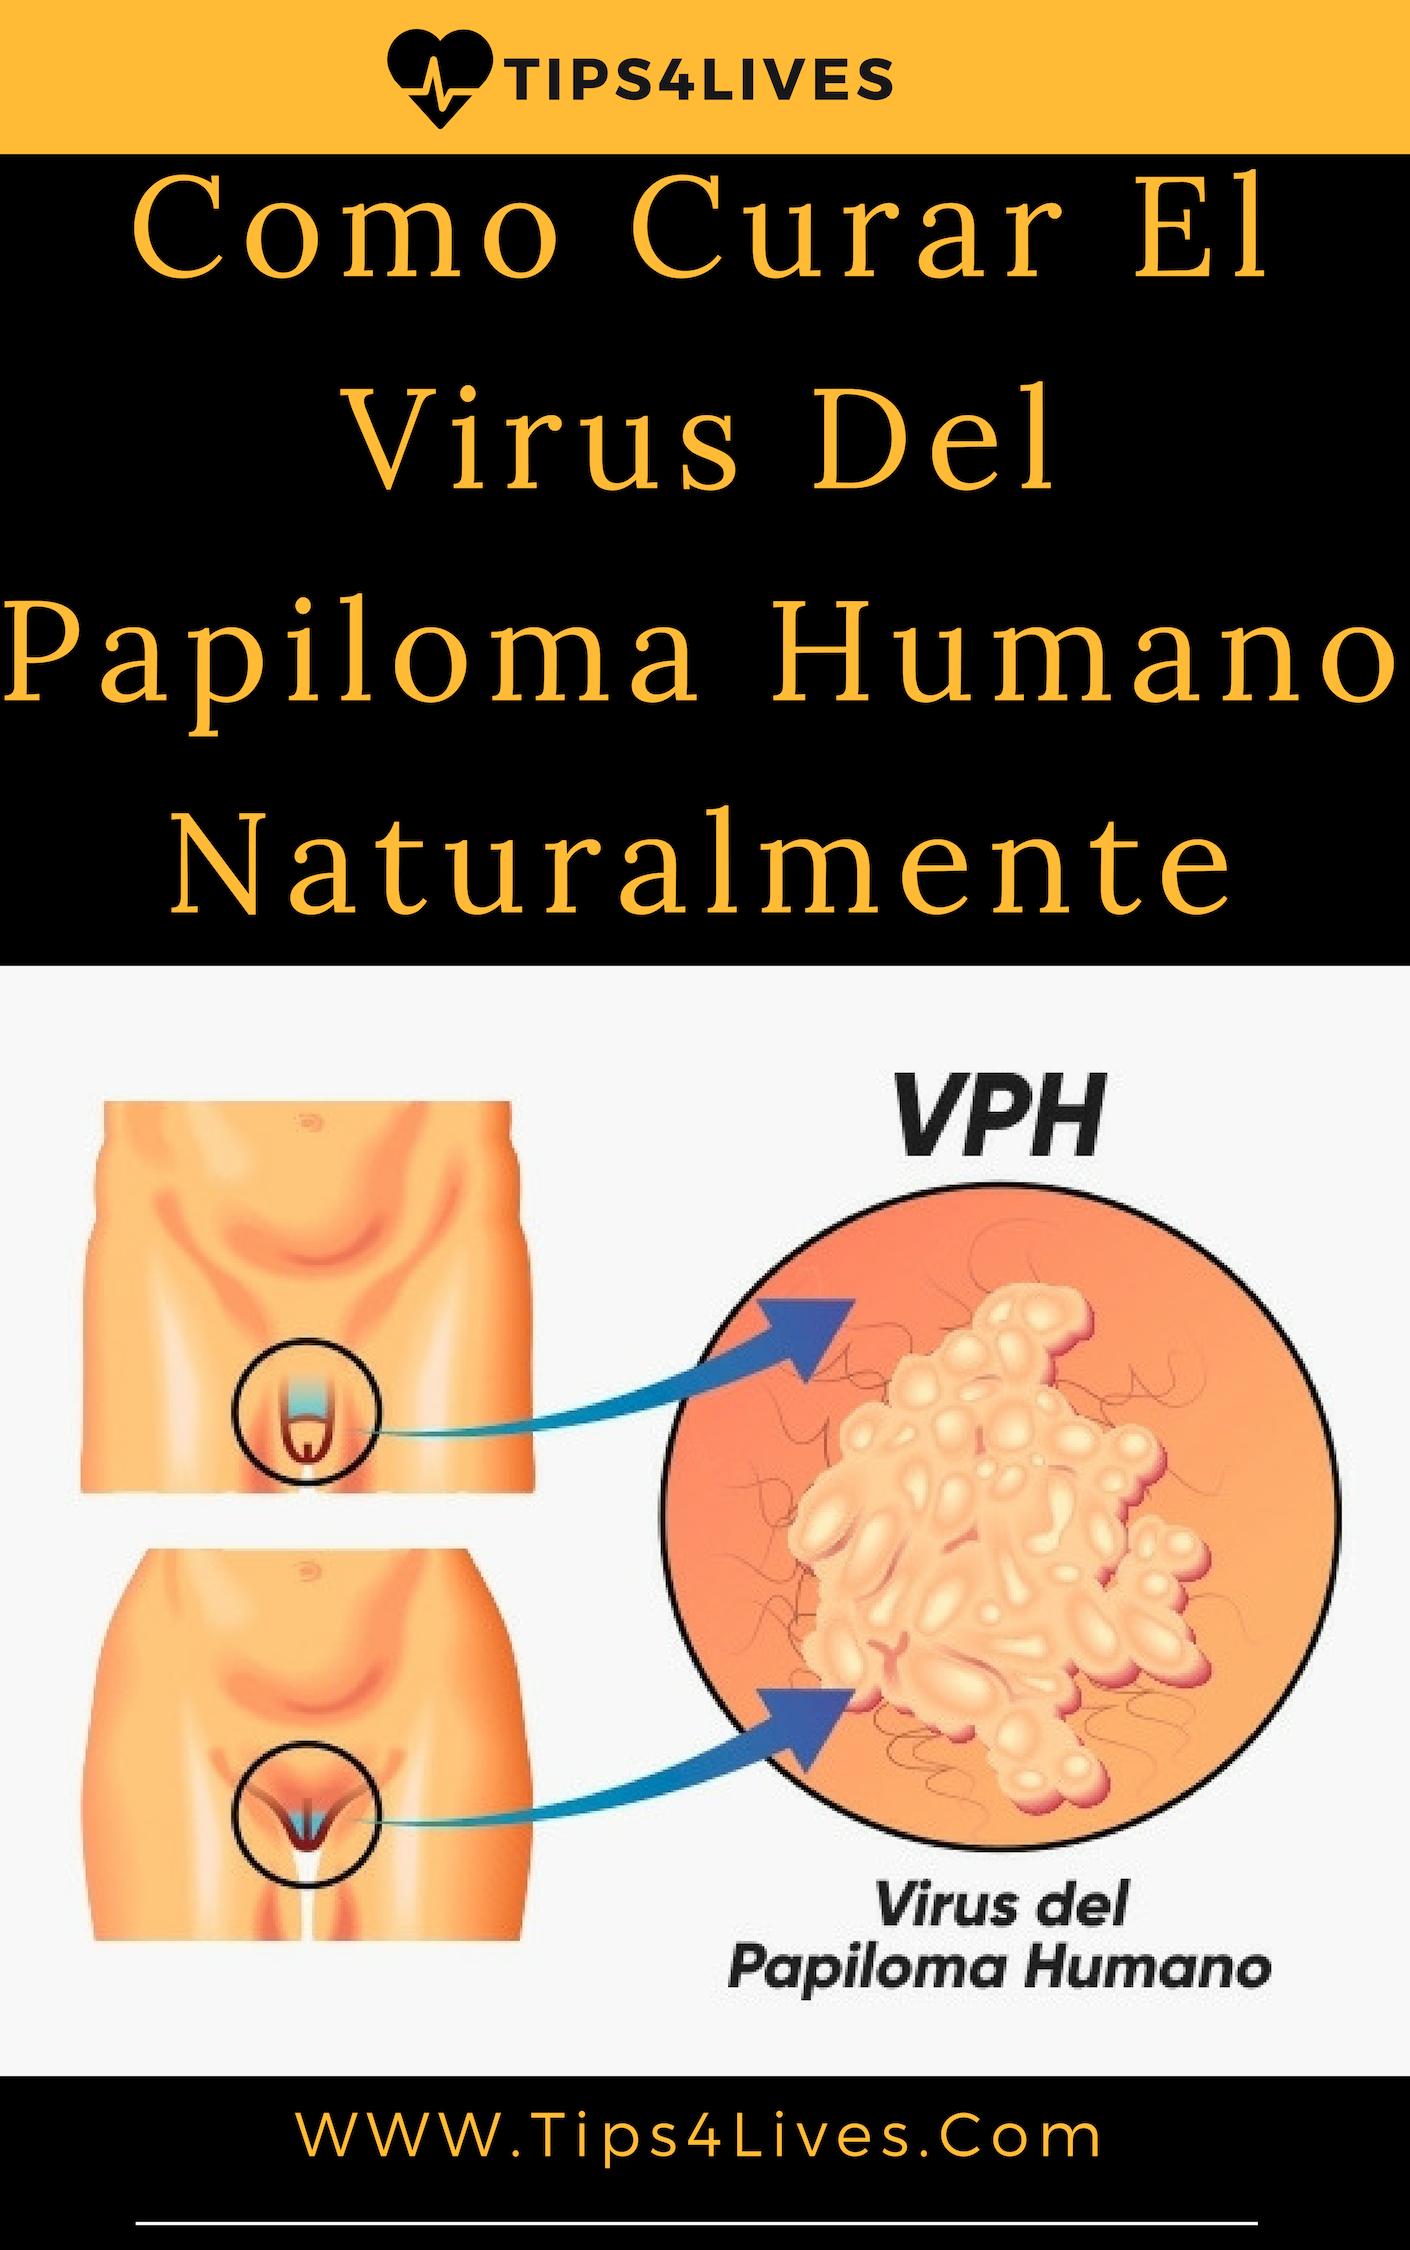 diarre o feber hpv dna screening for cervical cancer